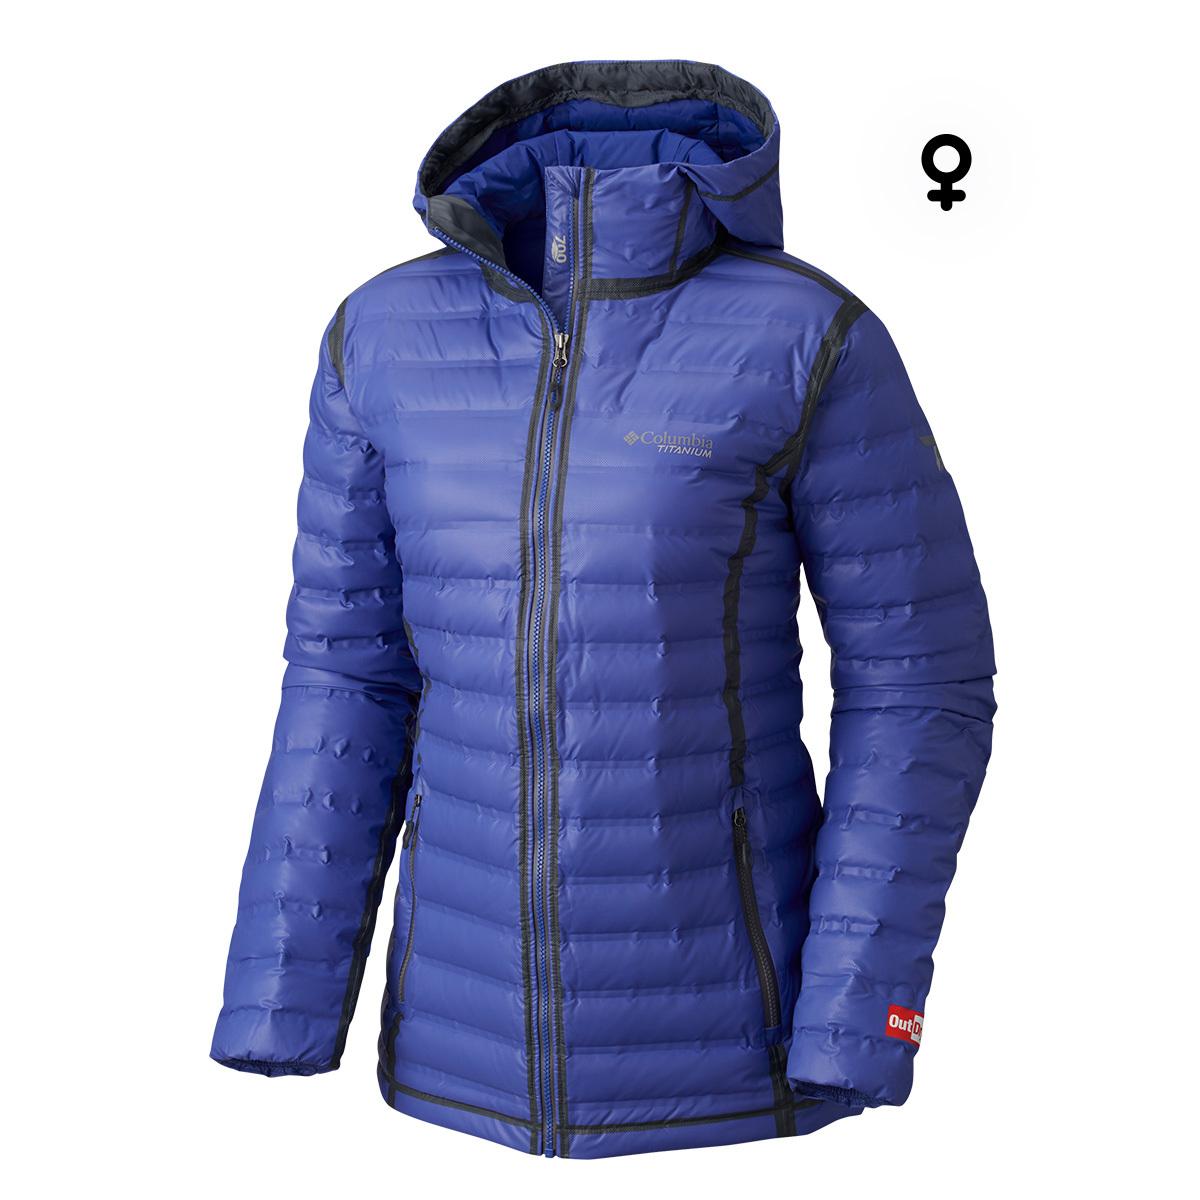 Qsport COLUMBIA Outdry Extreme Down jacket